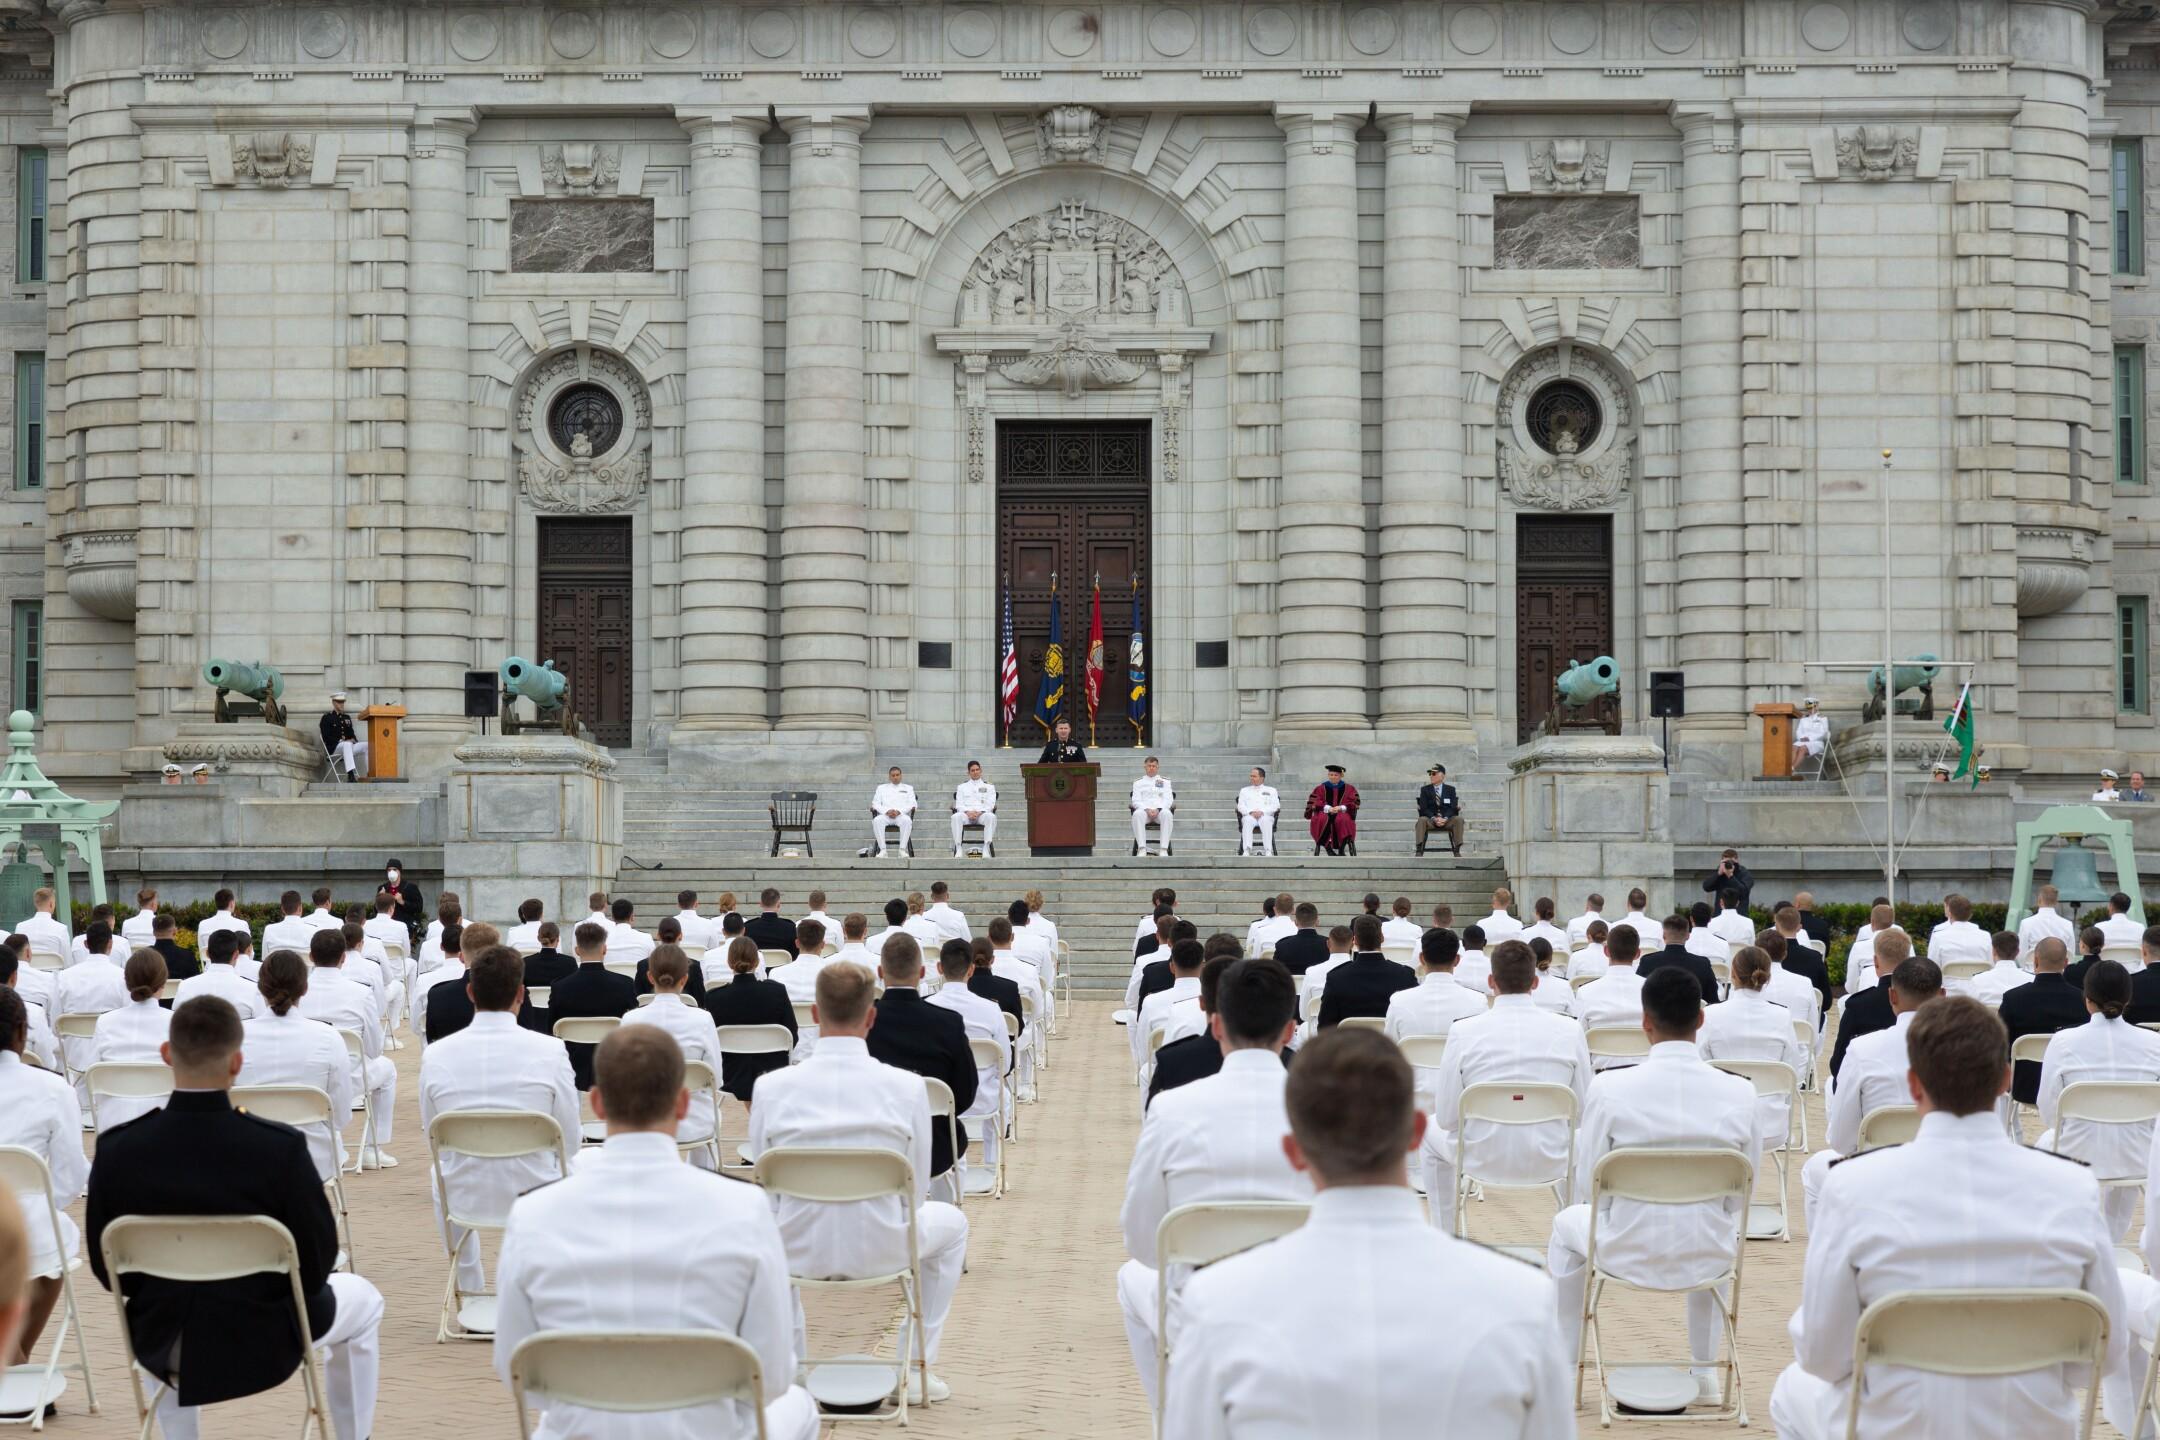 Photos courtesy of the US Naval Academy